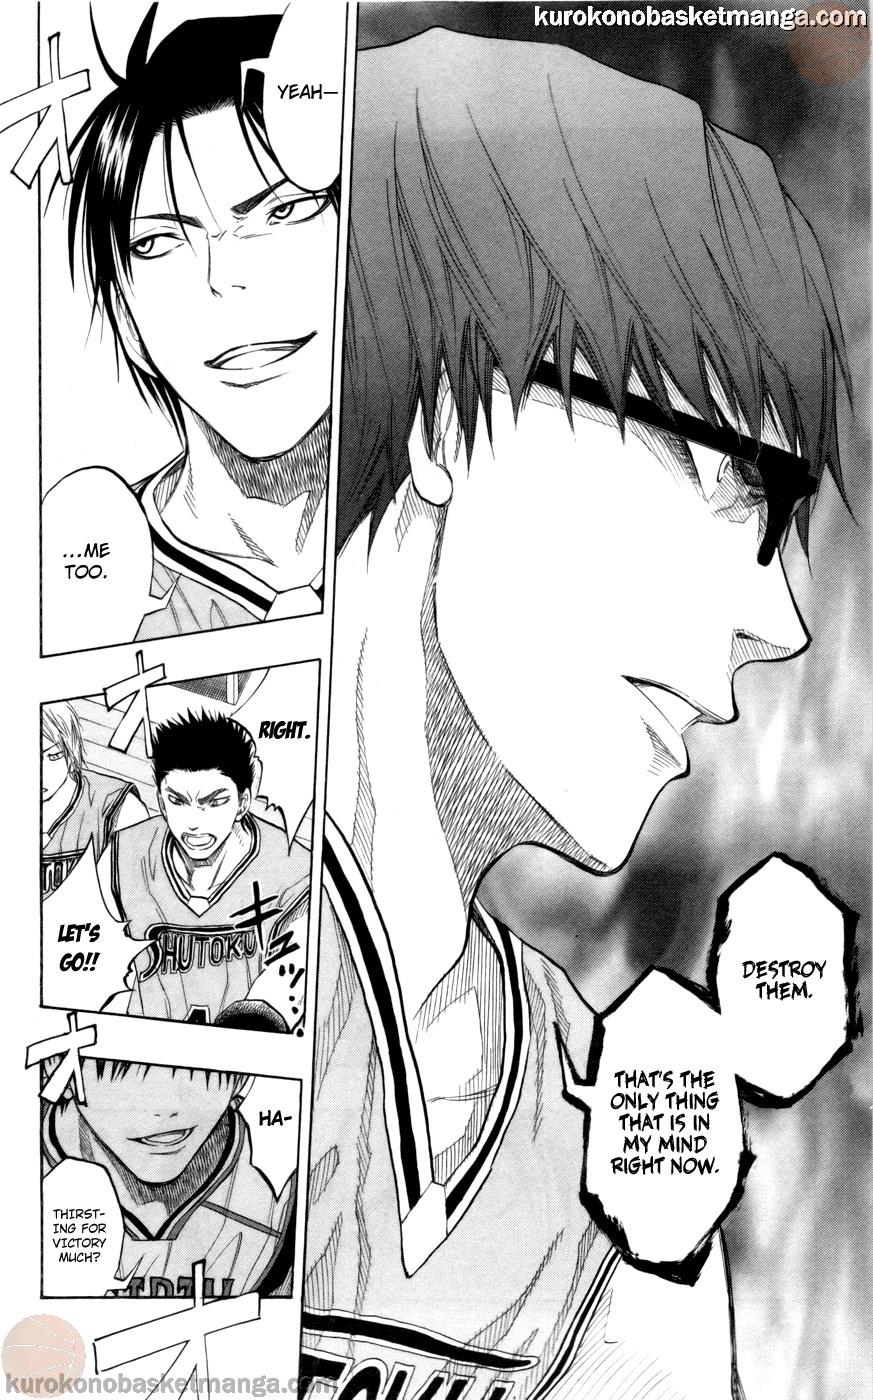 Kuroko no Basket Manga Chapter 85 - Image 18